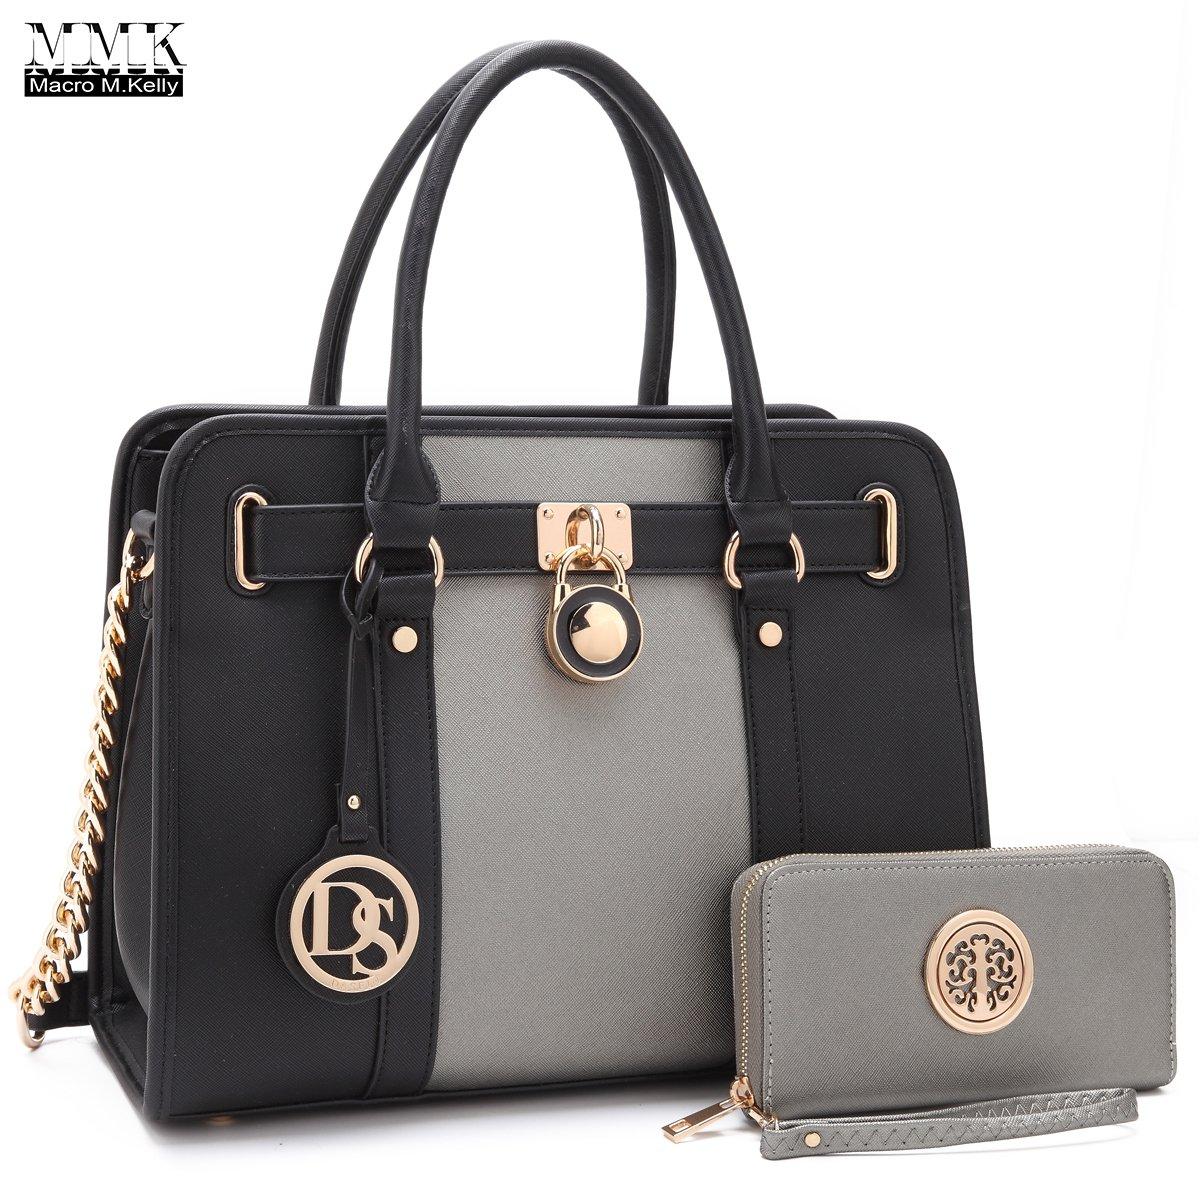 MMK collection Fashion Handbag with coin purse(XL-11) Classic Women Purse Handbag for Women` Signature fashion Designer Purse ~ Perfect Women Satchel Purse (XL-02-7103W-PT/BK)